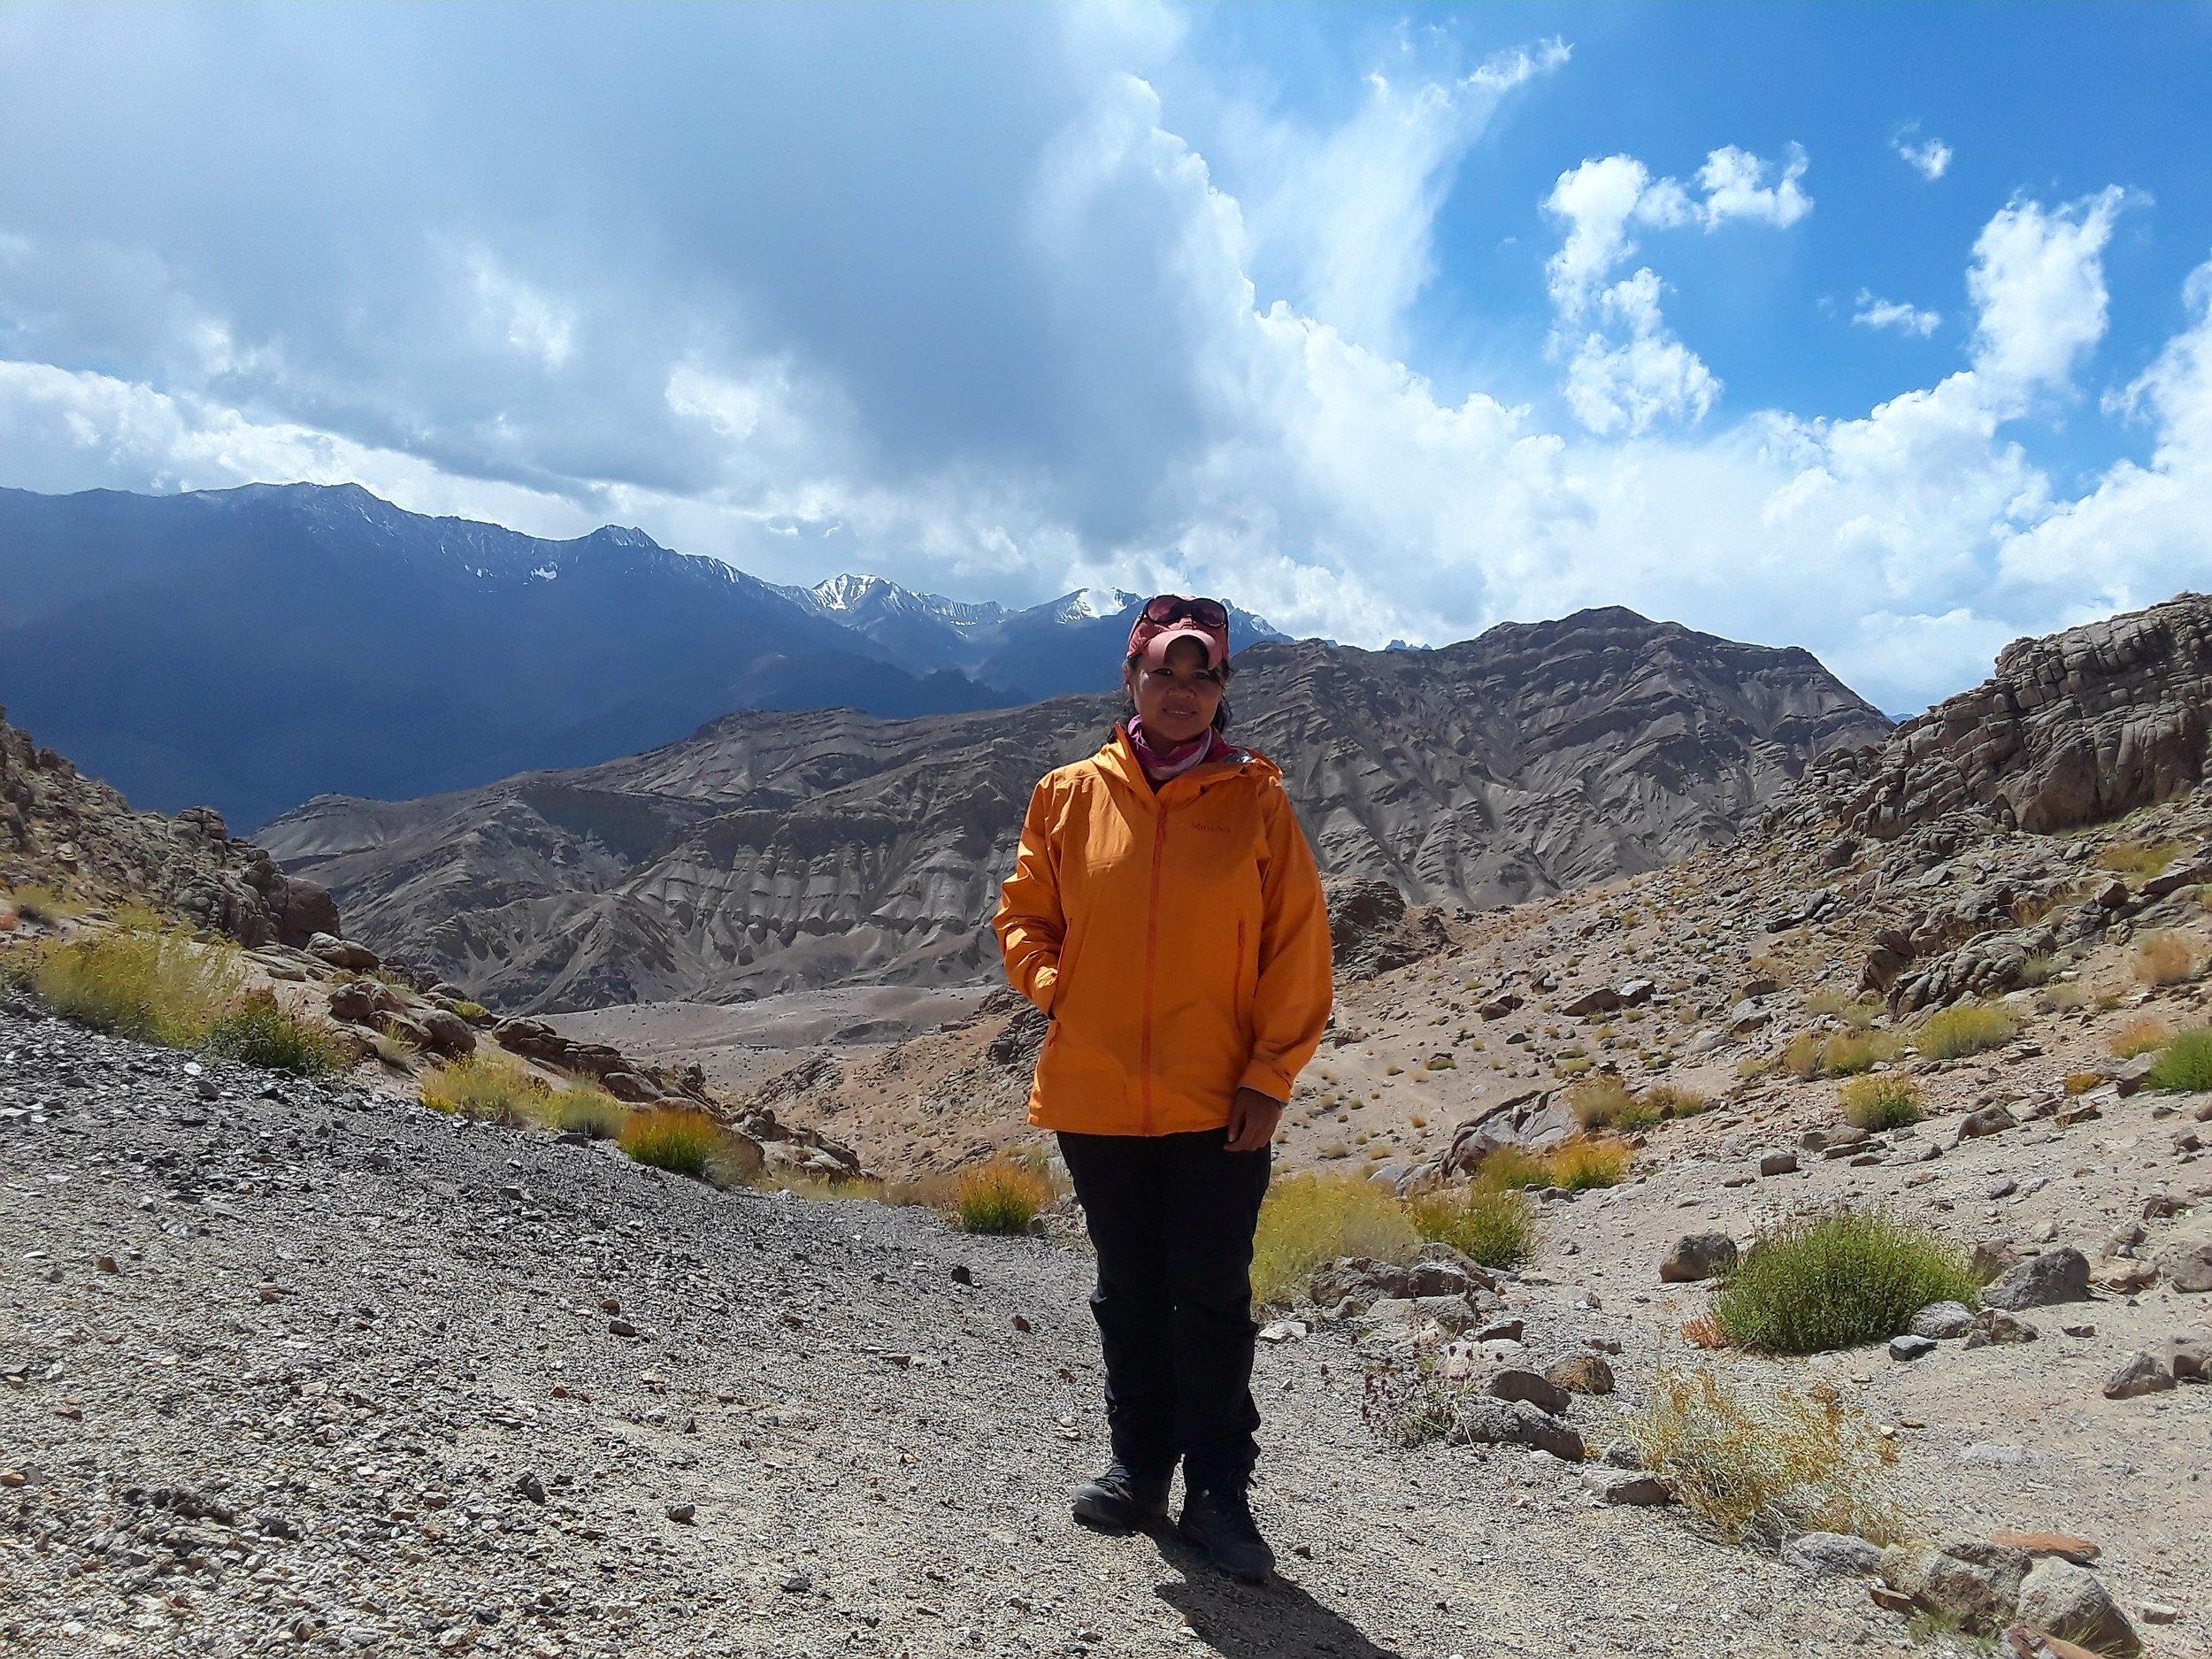 We reached the Pobe La pass with glacier peak views.